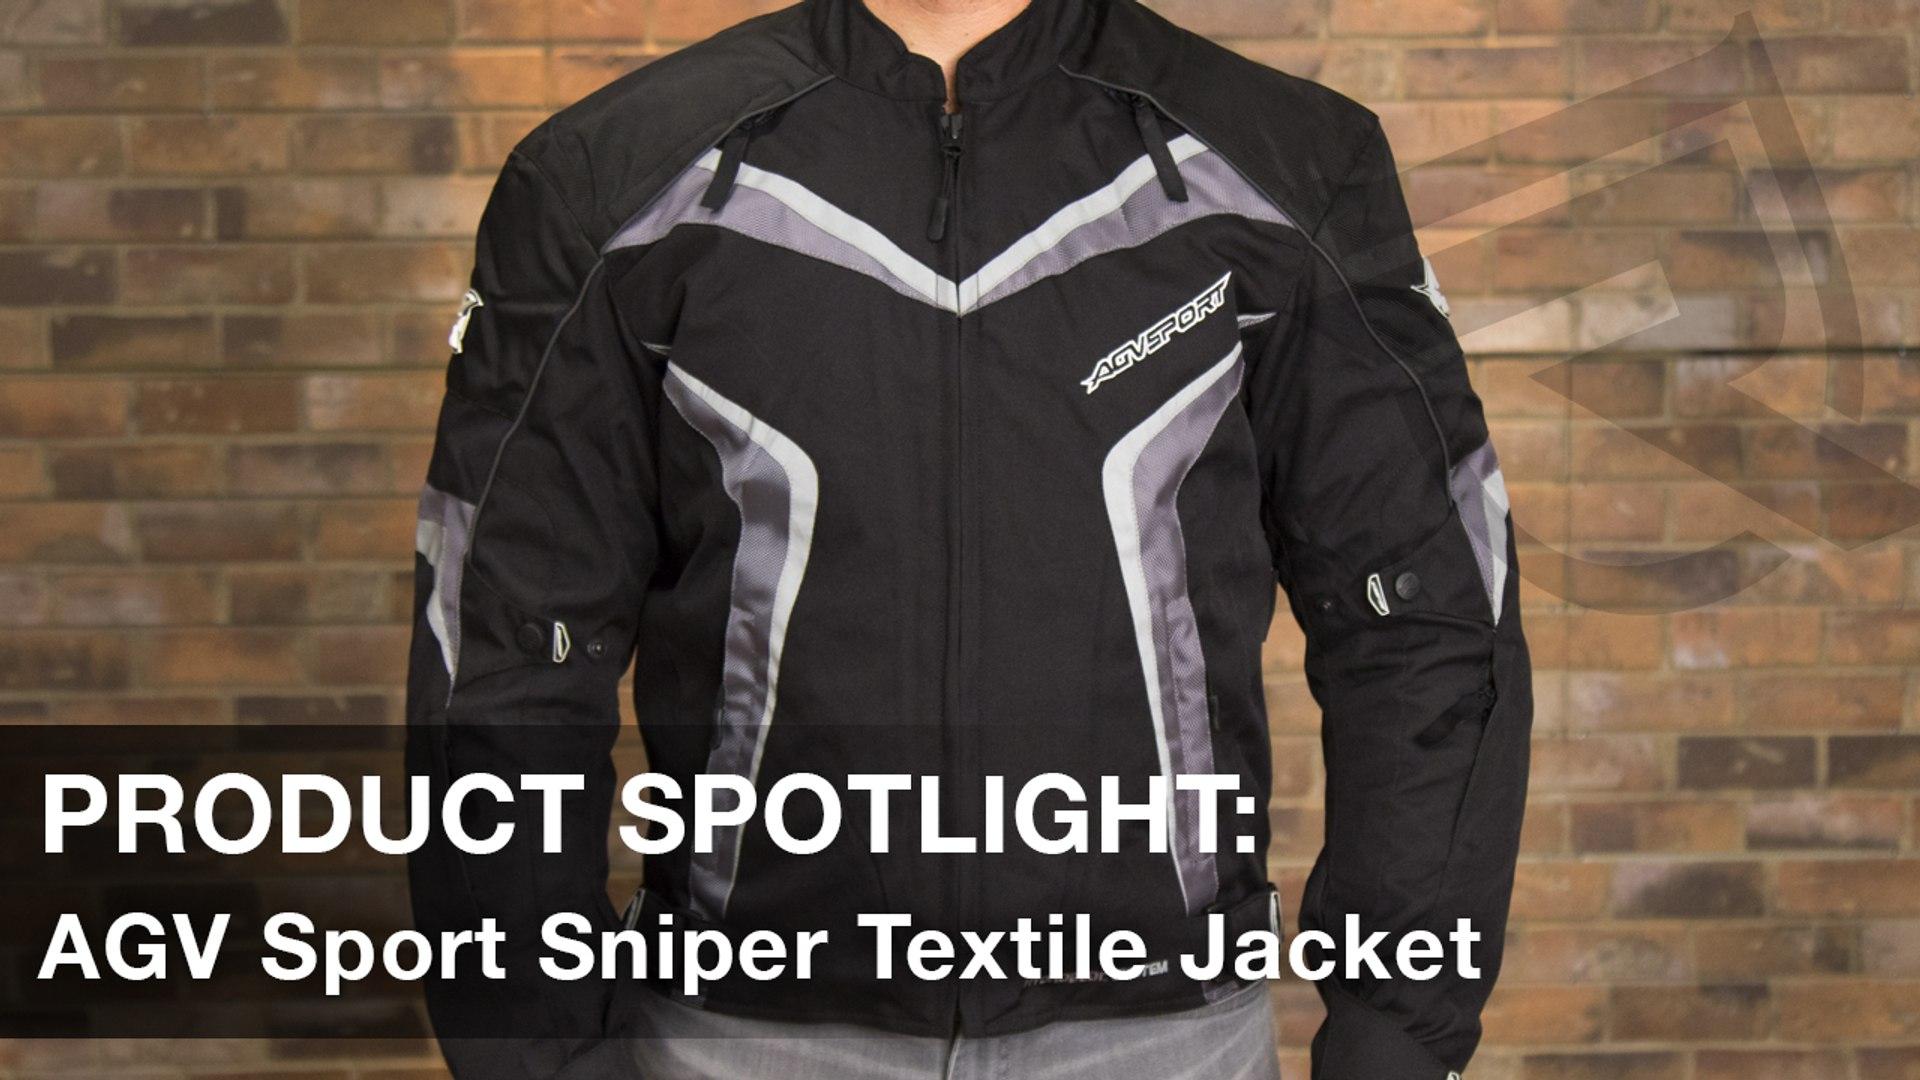 68415661d AGV Sport Sniper Motorcycle Jacket Product Spotlight Video | Riders Domain